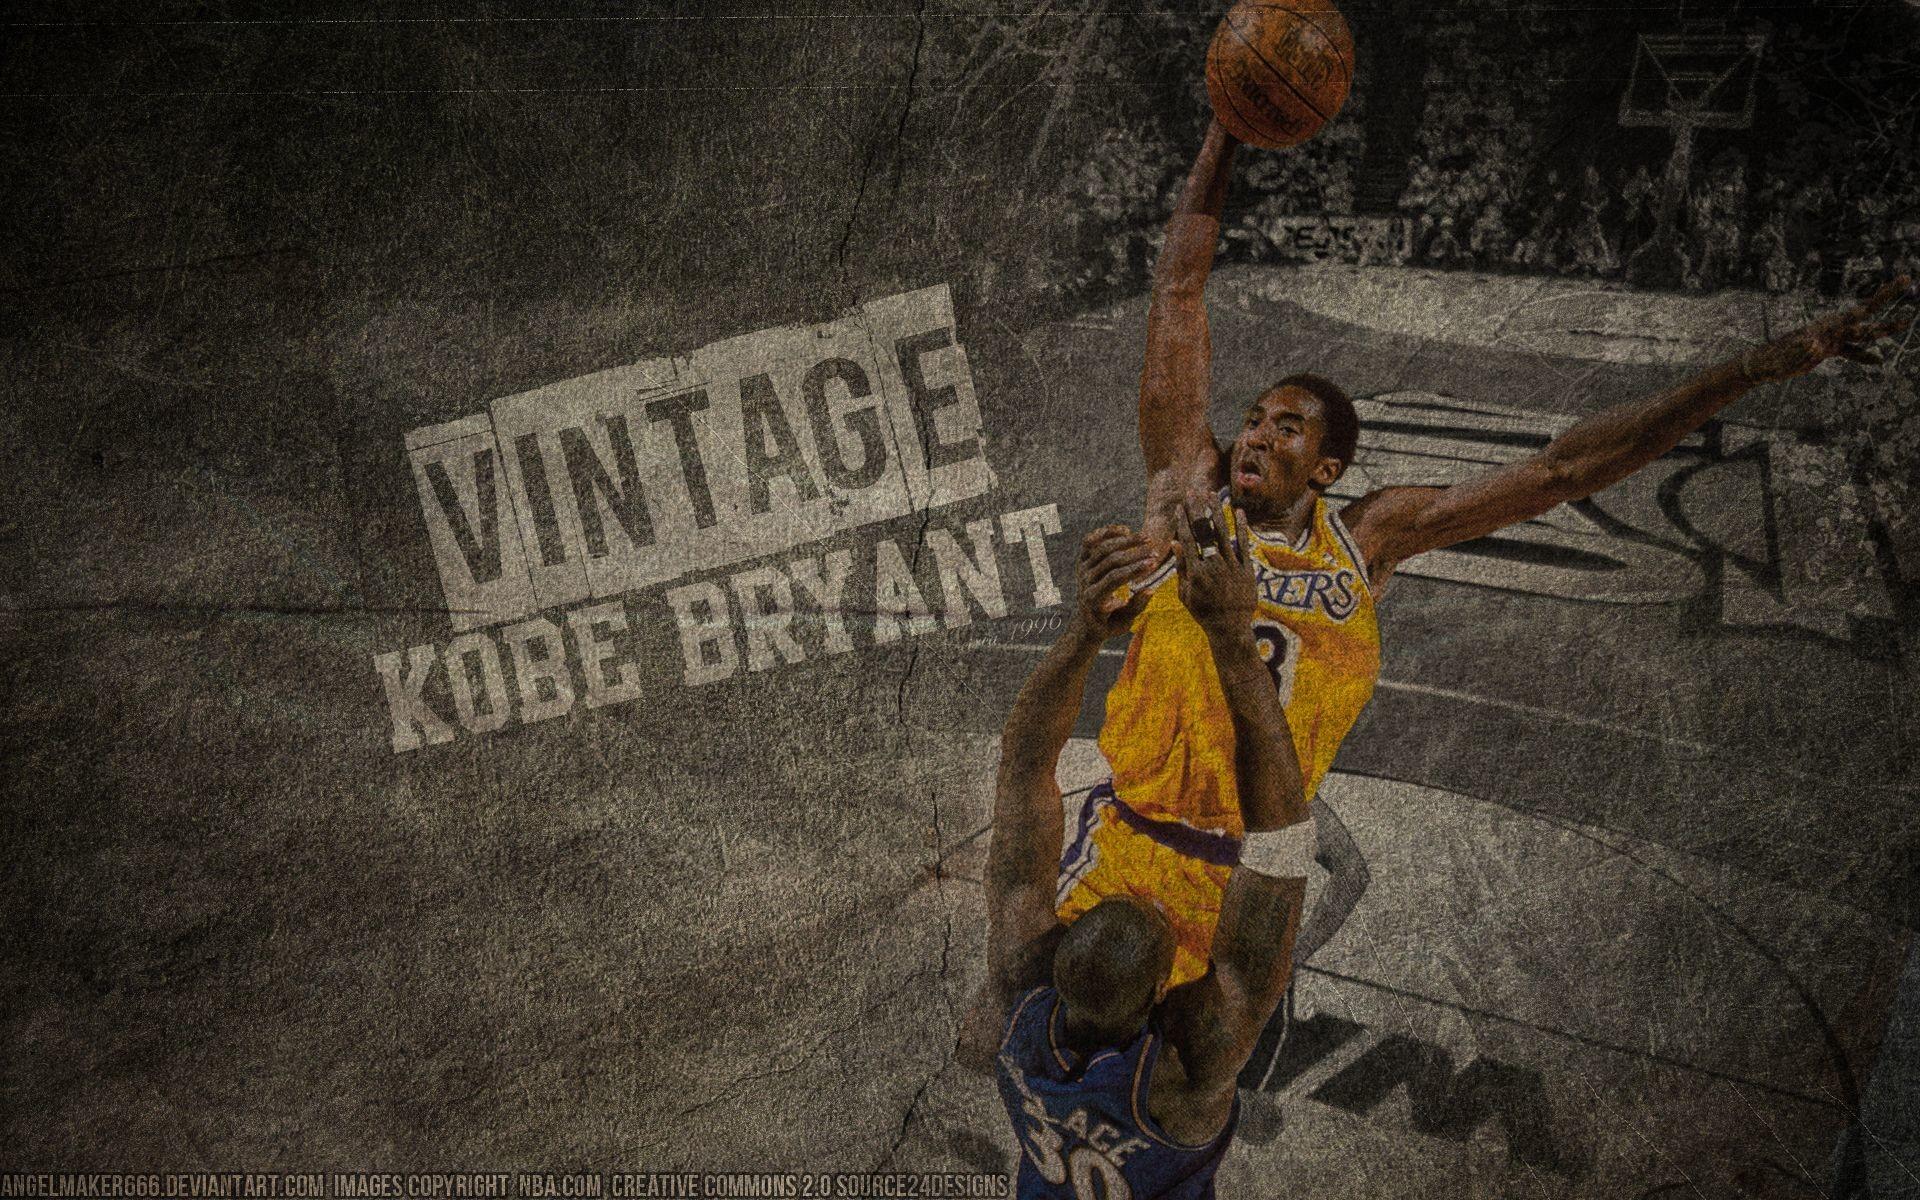 The Top 10 Los Angeles Lakers Kobe Bryant NBA Wallpapers .